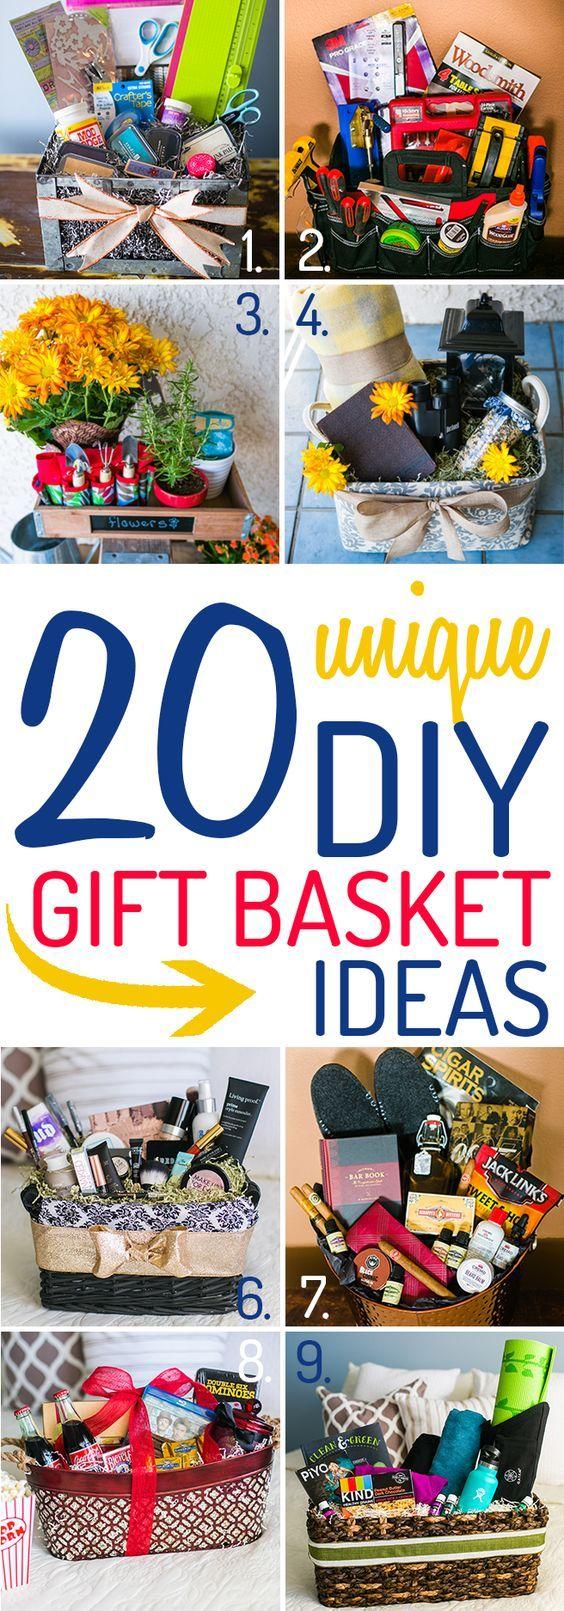 20 Unique Diy Wind Chimes: 20 Unique DIY Gift Basket Ideas